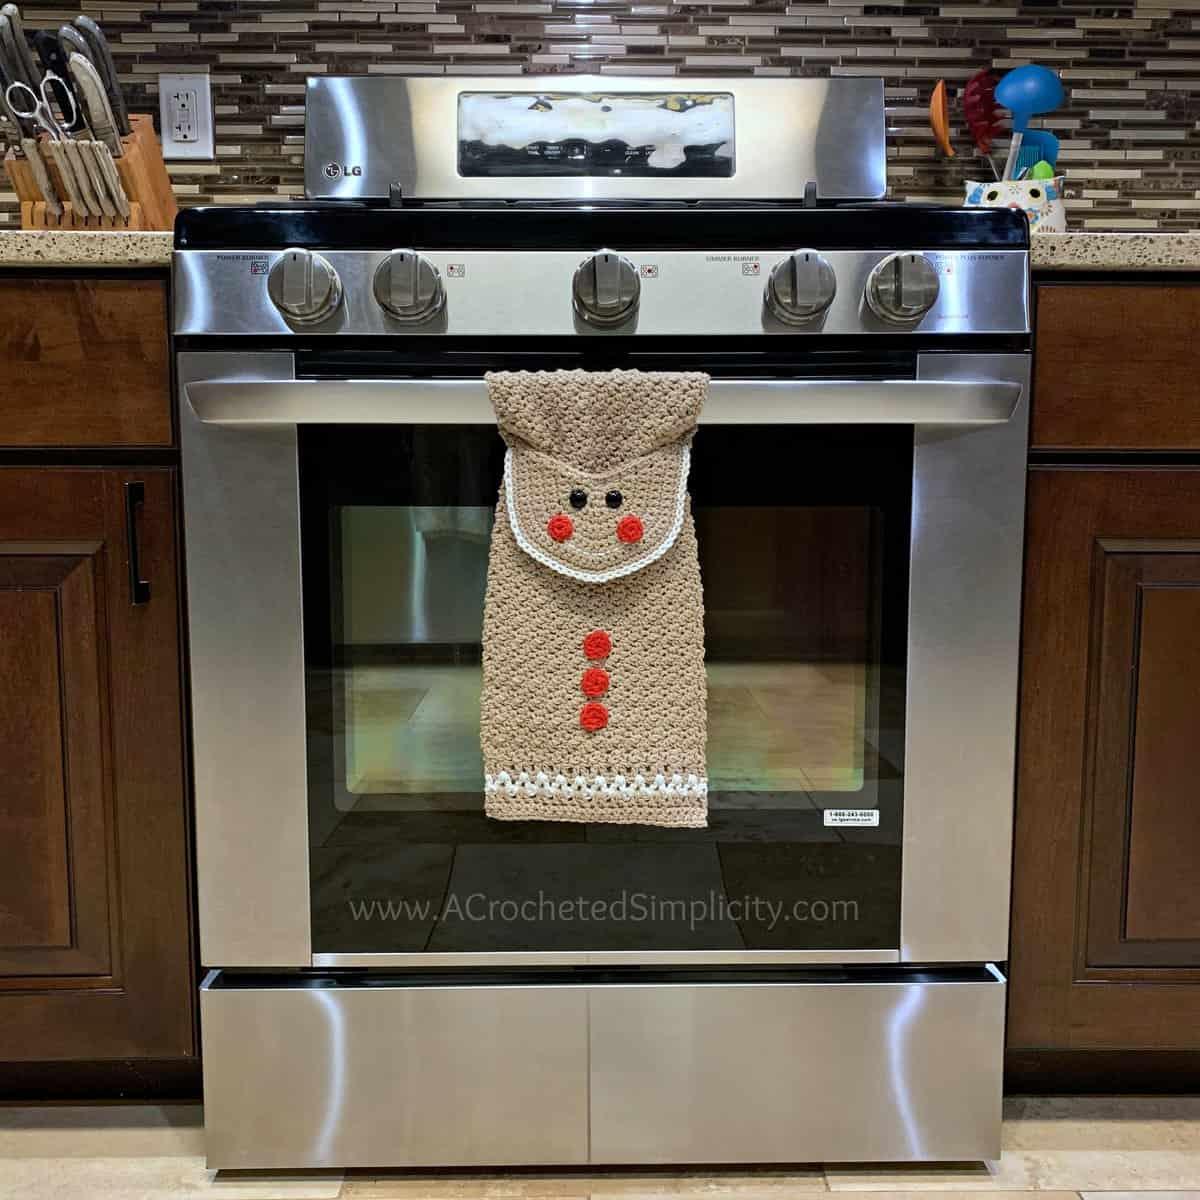 Gingerbread Man Kitchen Towel